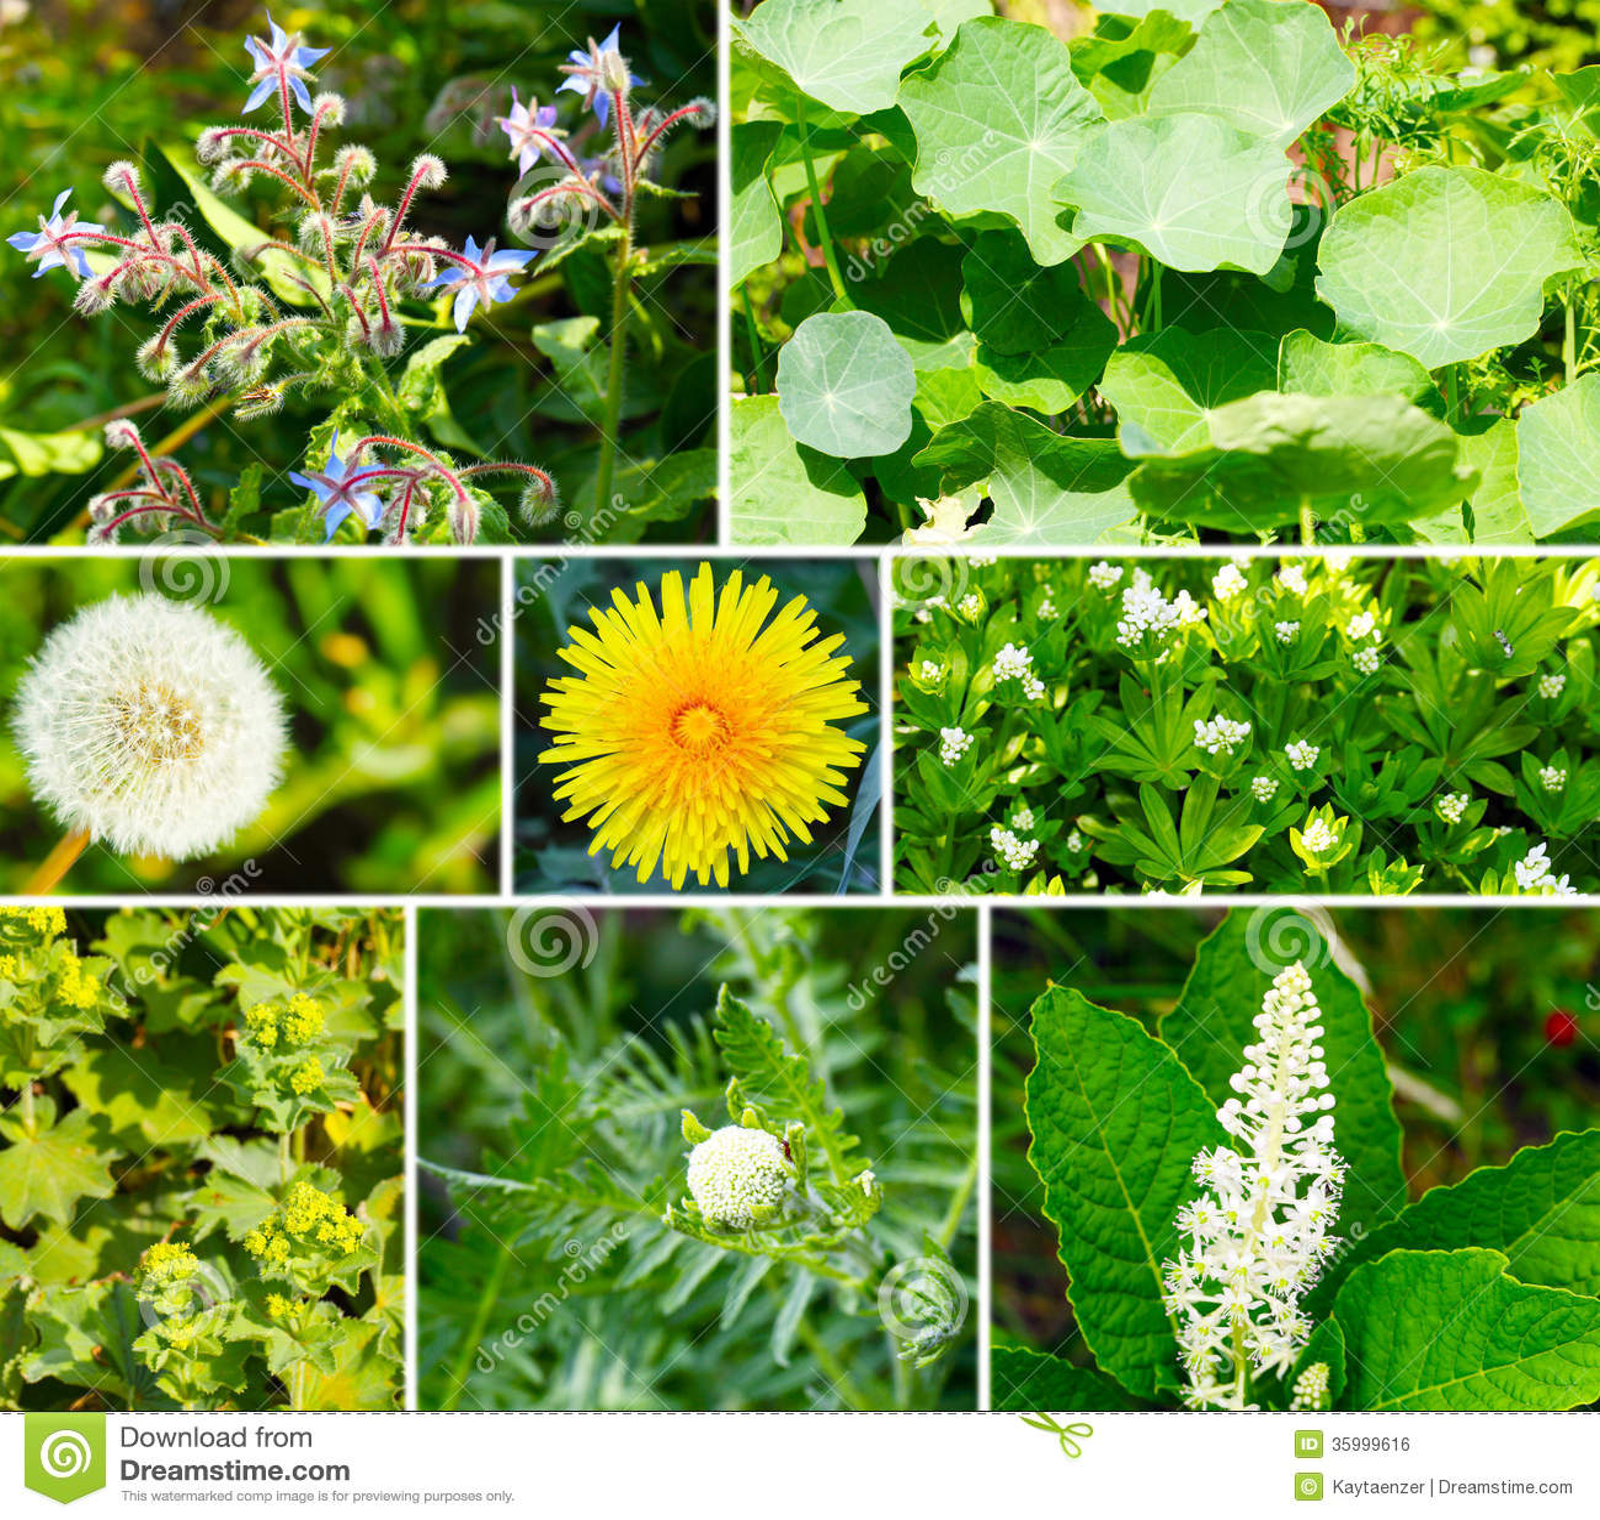 Wild And Medicinal Herbs Royalty Free Stock Image  Image 35999616